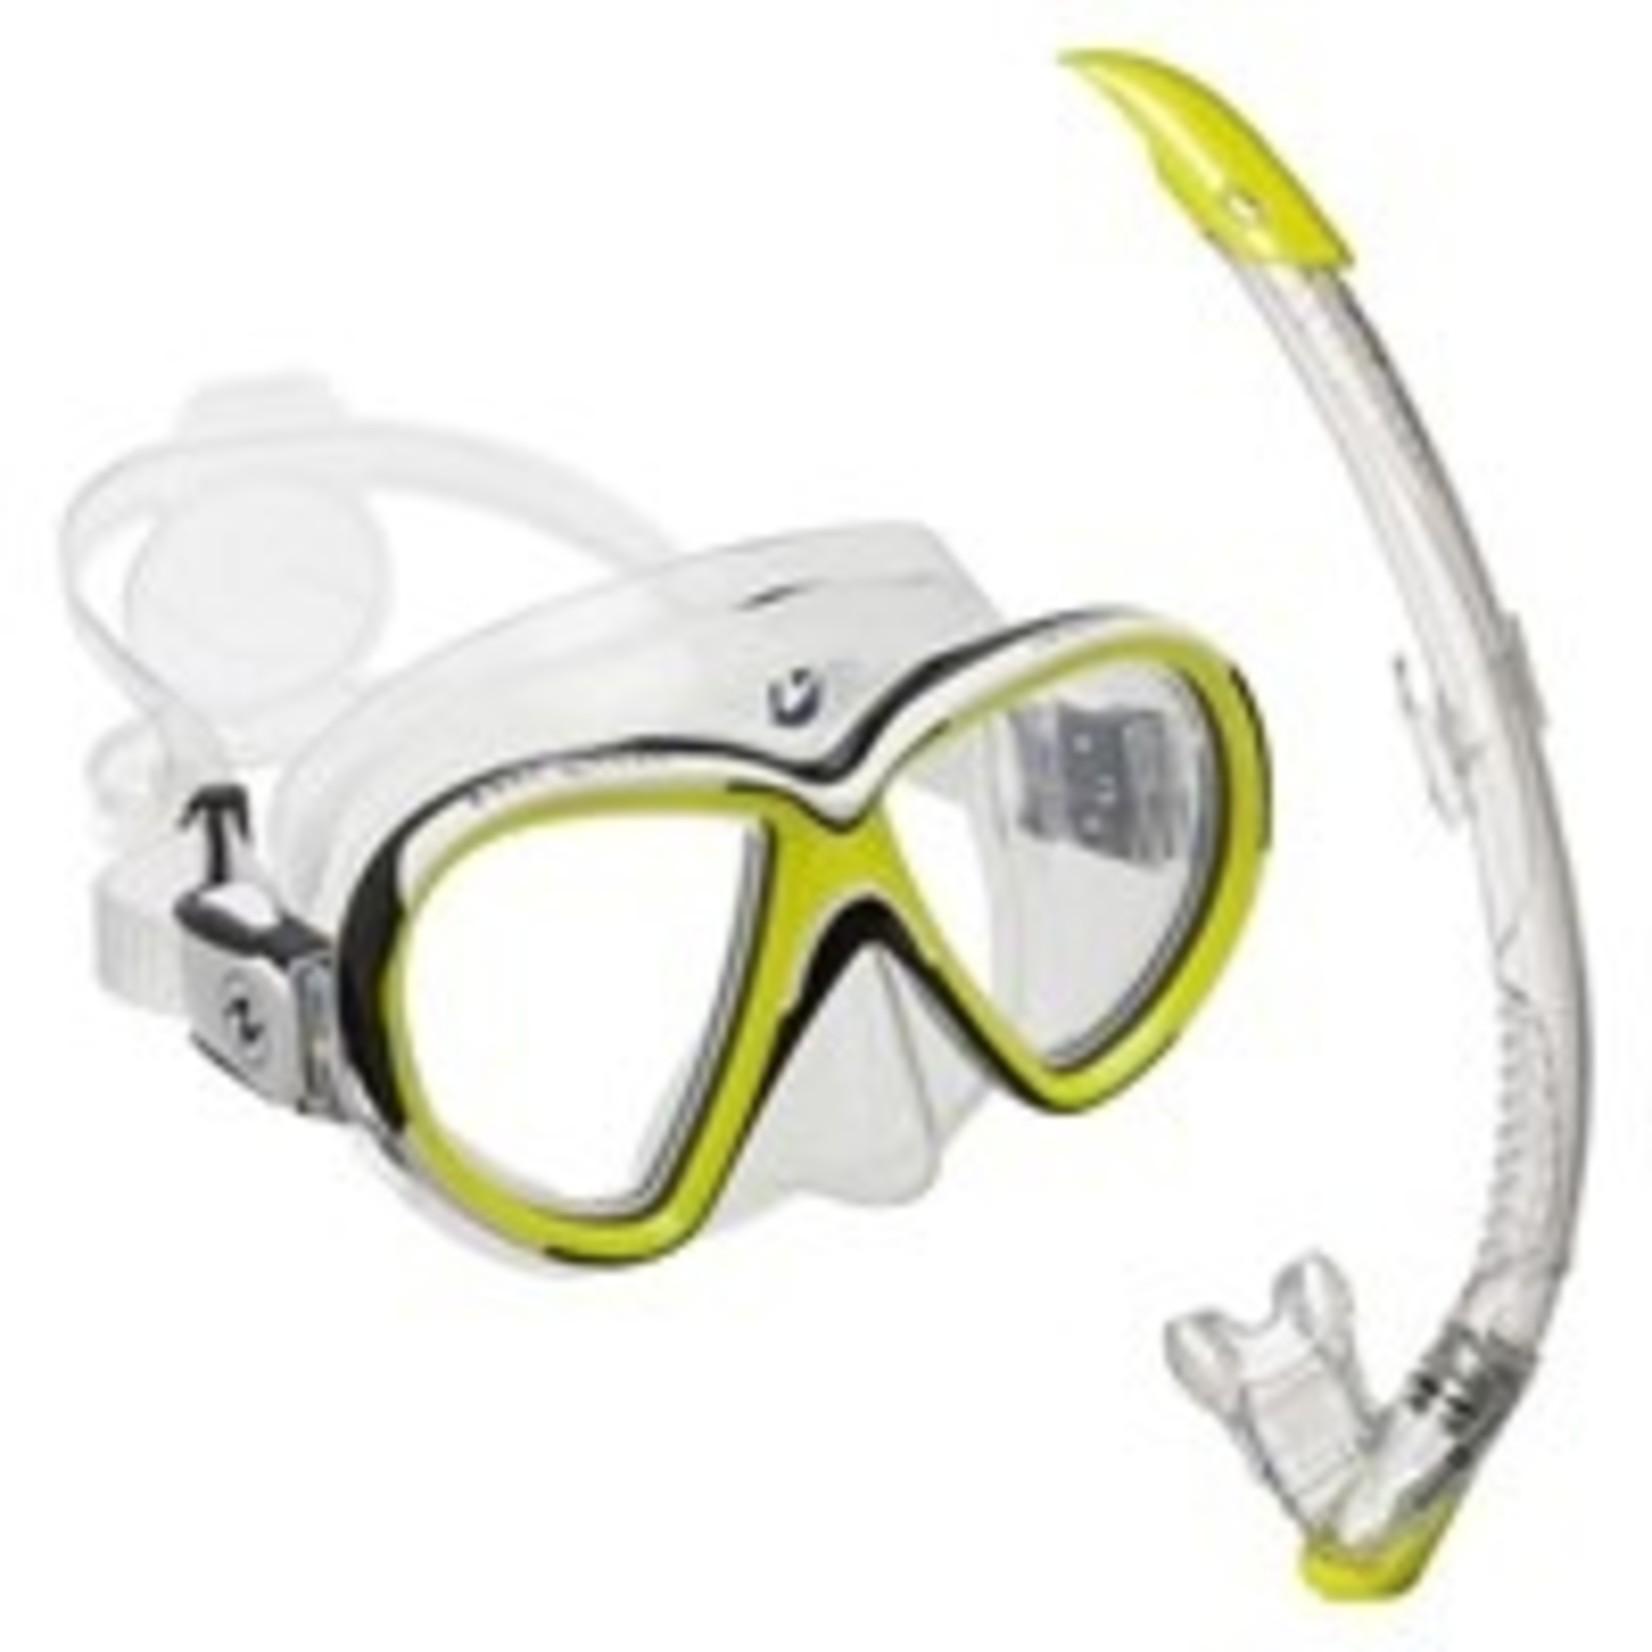 Aqua Lung Set Reveal X2 TS Hot Lime + Zephyr Transparant/Hot Lime